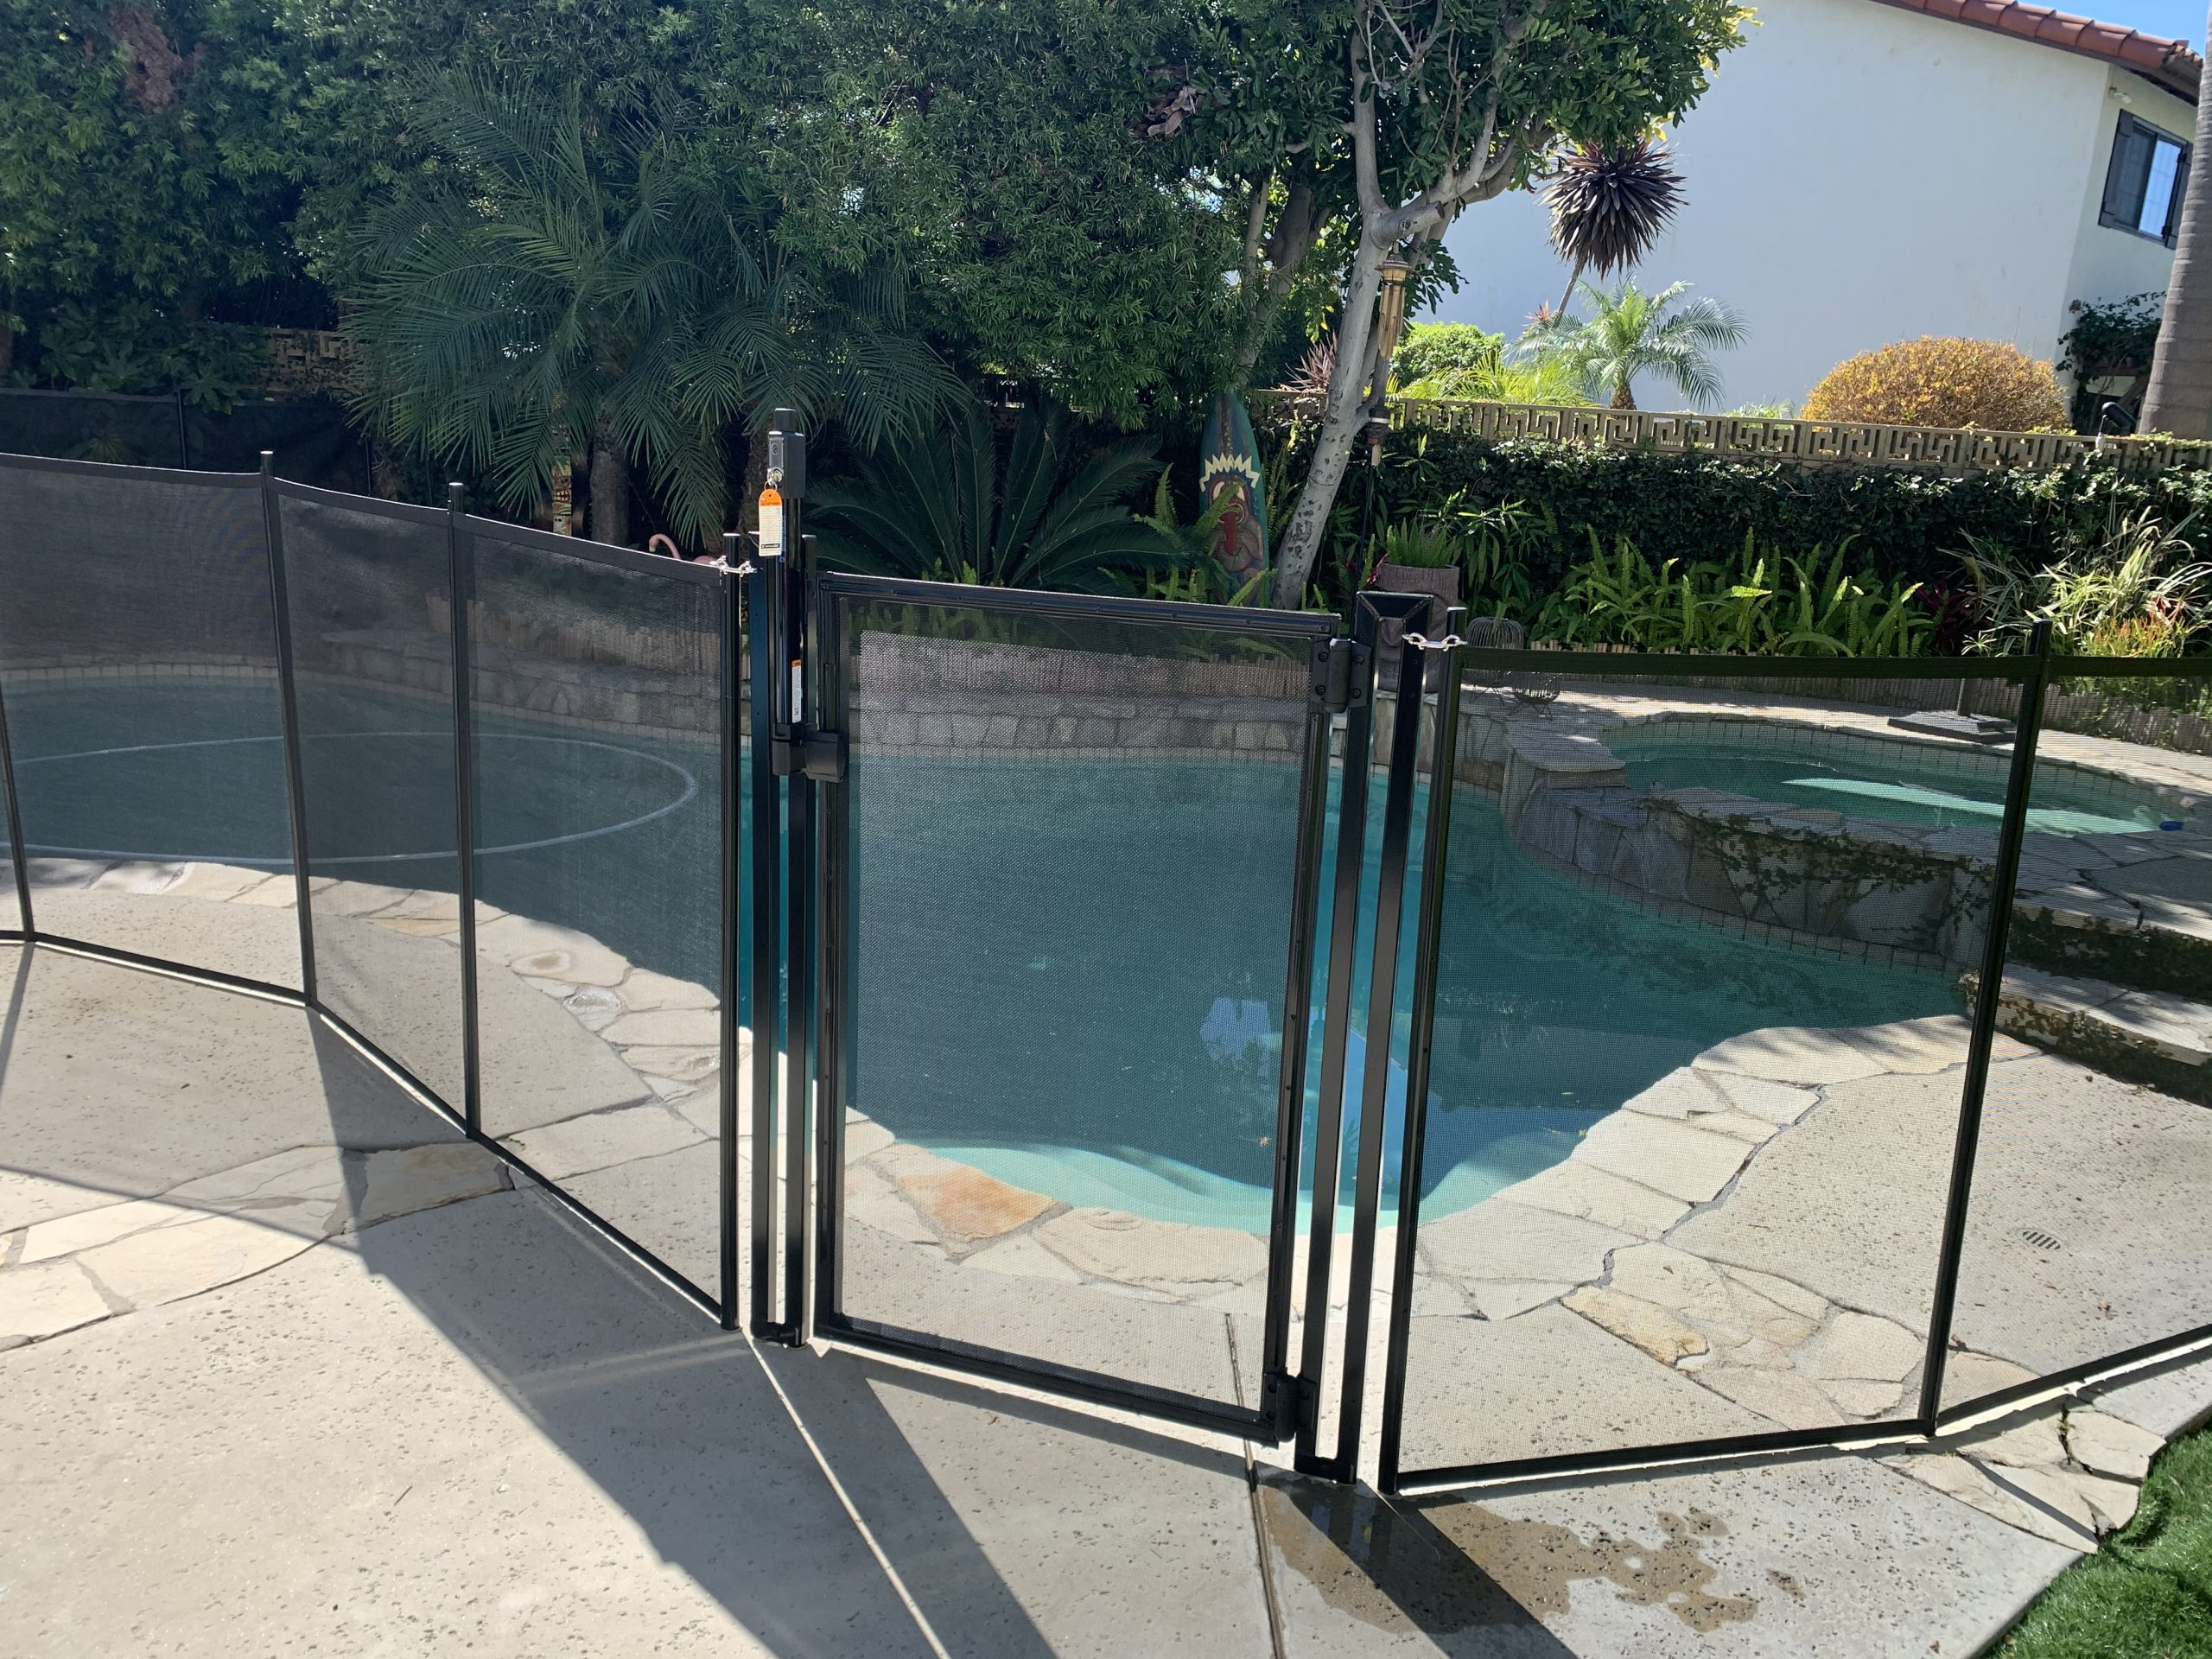 pool fencing installed by King's Pool Fencing in Long Beach, CA - Oscar B